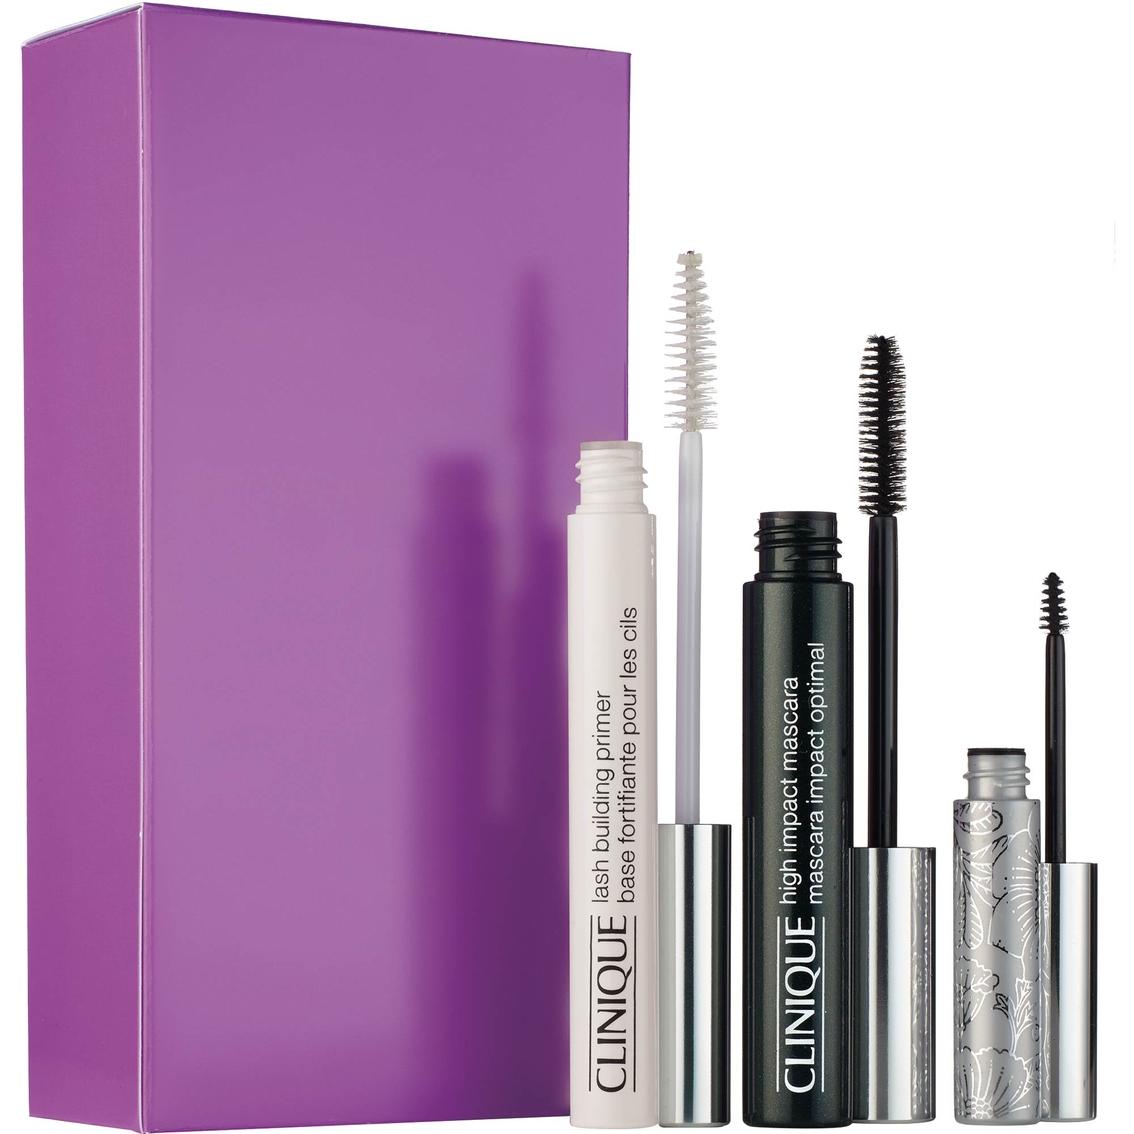 480acff0e1a Clinique Lash Bash Set | Mascara | Beauty & Health | Shop The Exchange